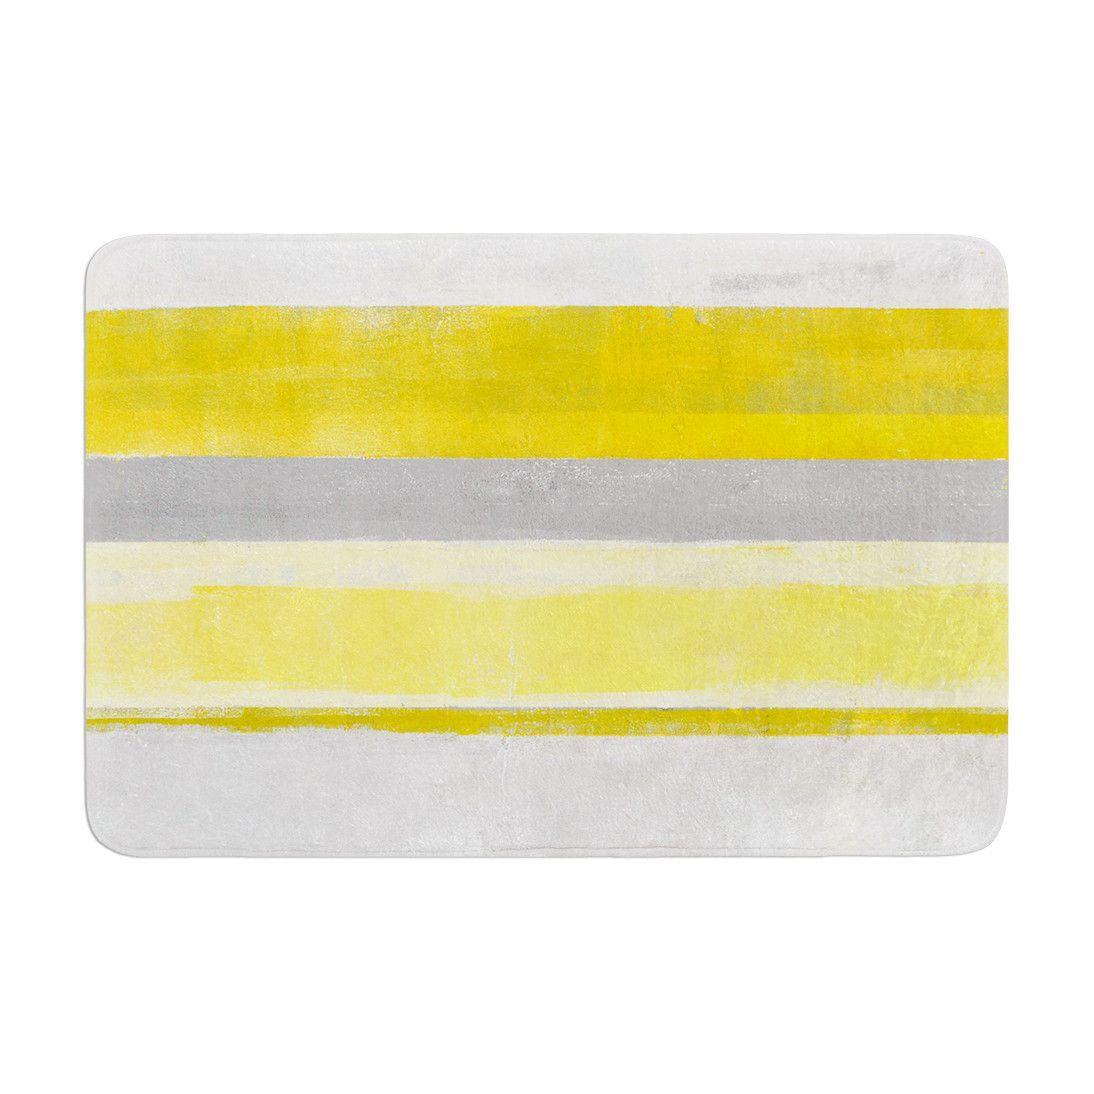 Carollynn Tice Lemon Yellow Gray Memory Foam Bath Mat